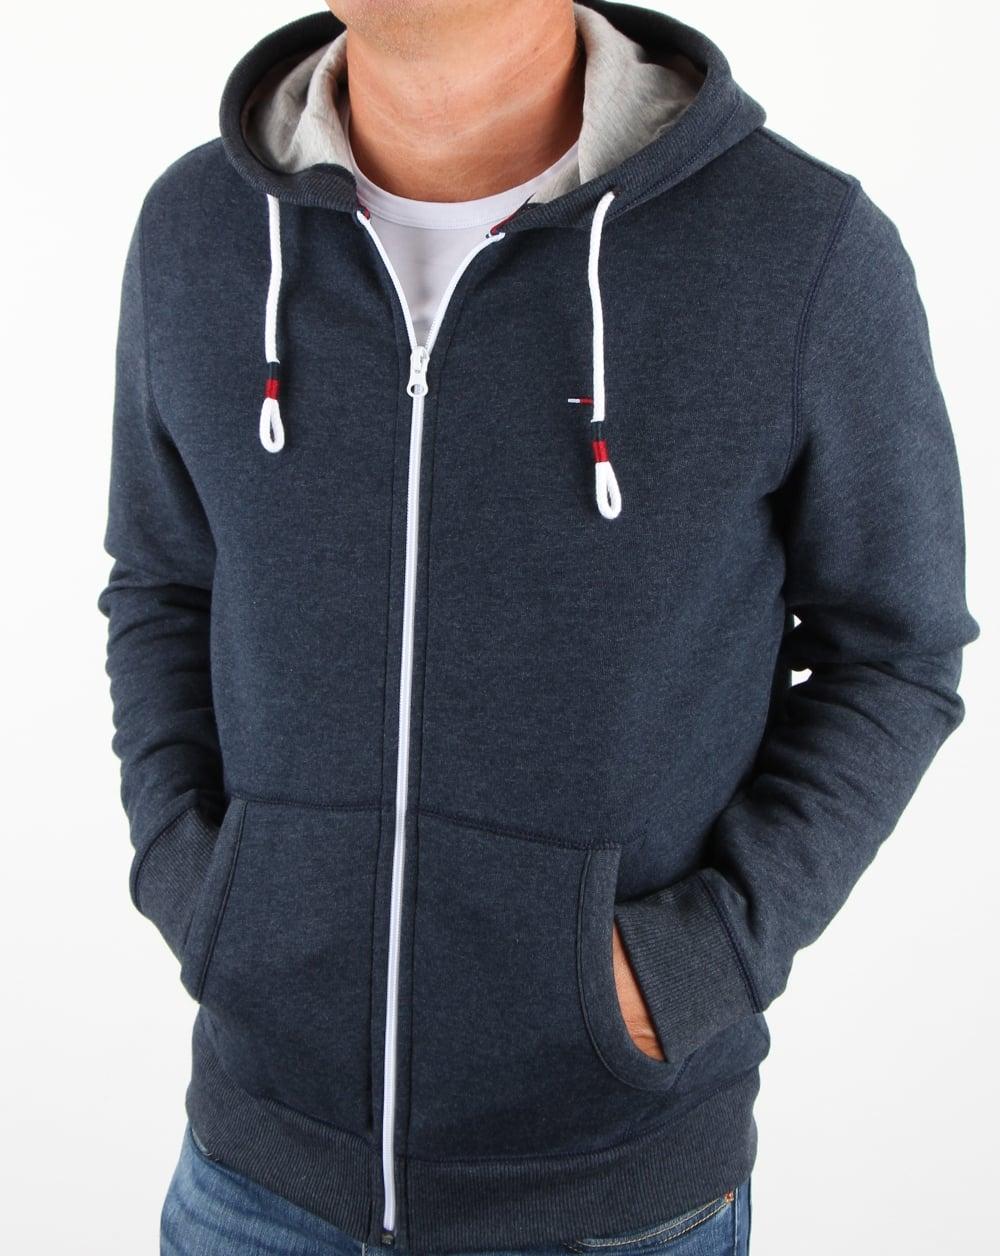 tommy hilfiger cotton fleece hoody navy hooded sweatshirt mens. Black Bedroom Furniture Sets. Home Design Ideas